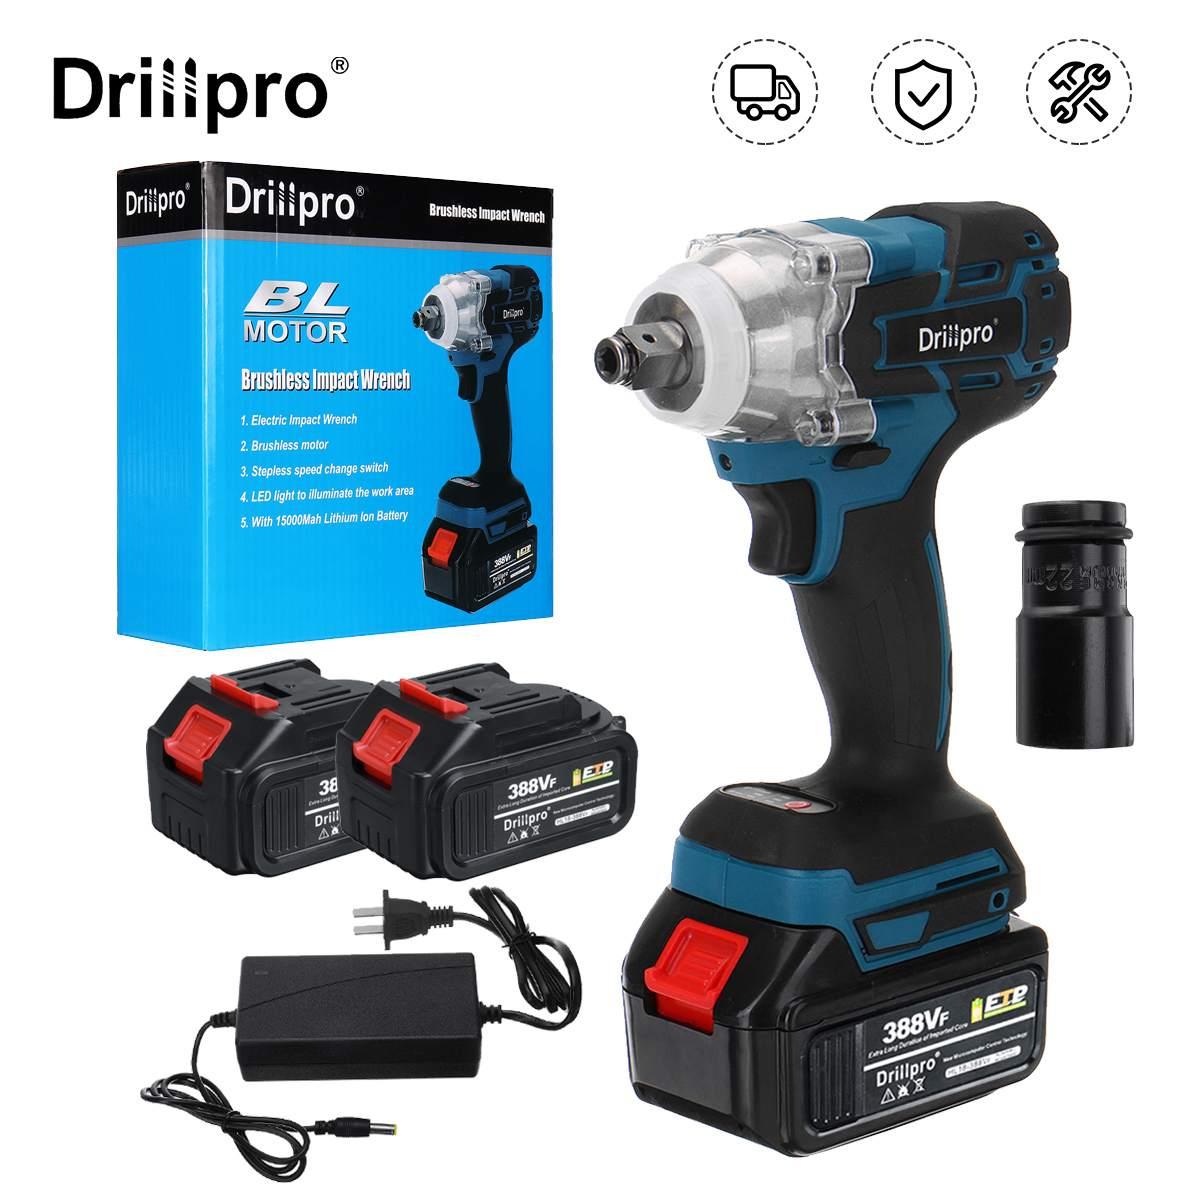 Drillpro 388VF بدون فرشاة لاسلكي مفتاح برغي كهربائي 1/2 بوصة أدوات كهربائية 15000Amh بطارية كم لبطارية ماكيتا 18 فولت